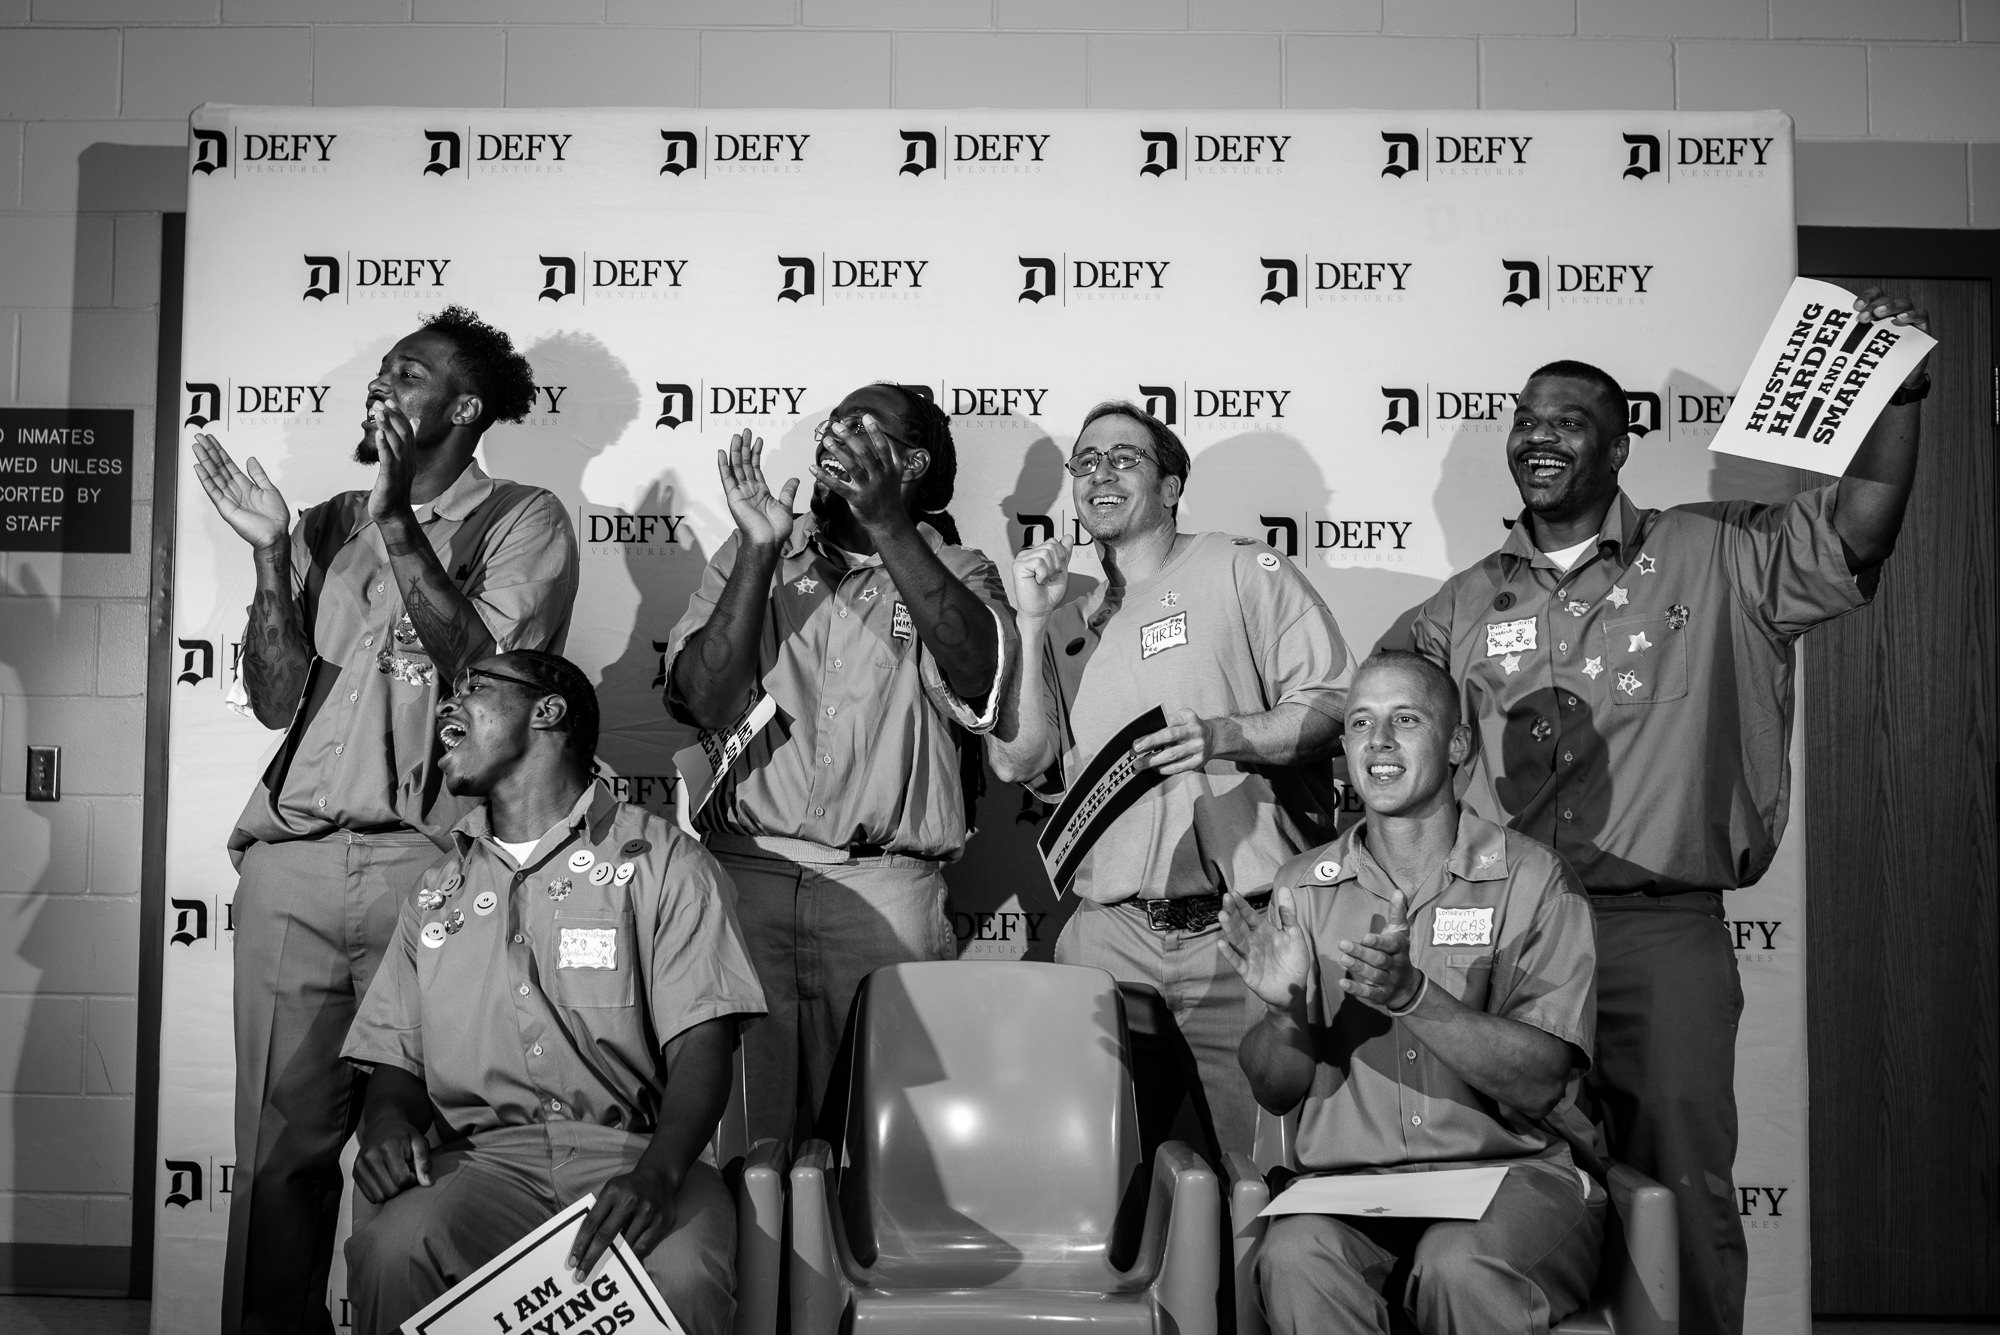 DEFY VENTURES TECUMSEH CORRECTIONAL INSTITUTION NEBRASKA 2017-0012.JPG